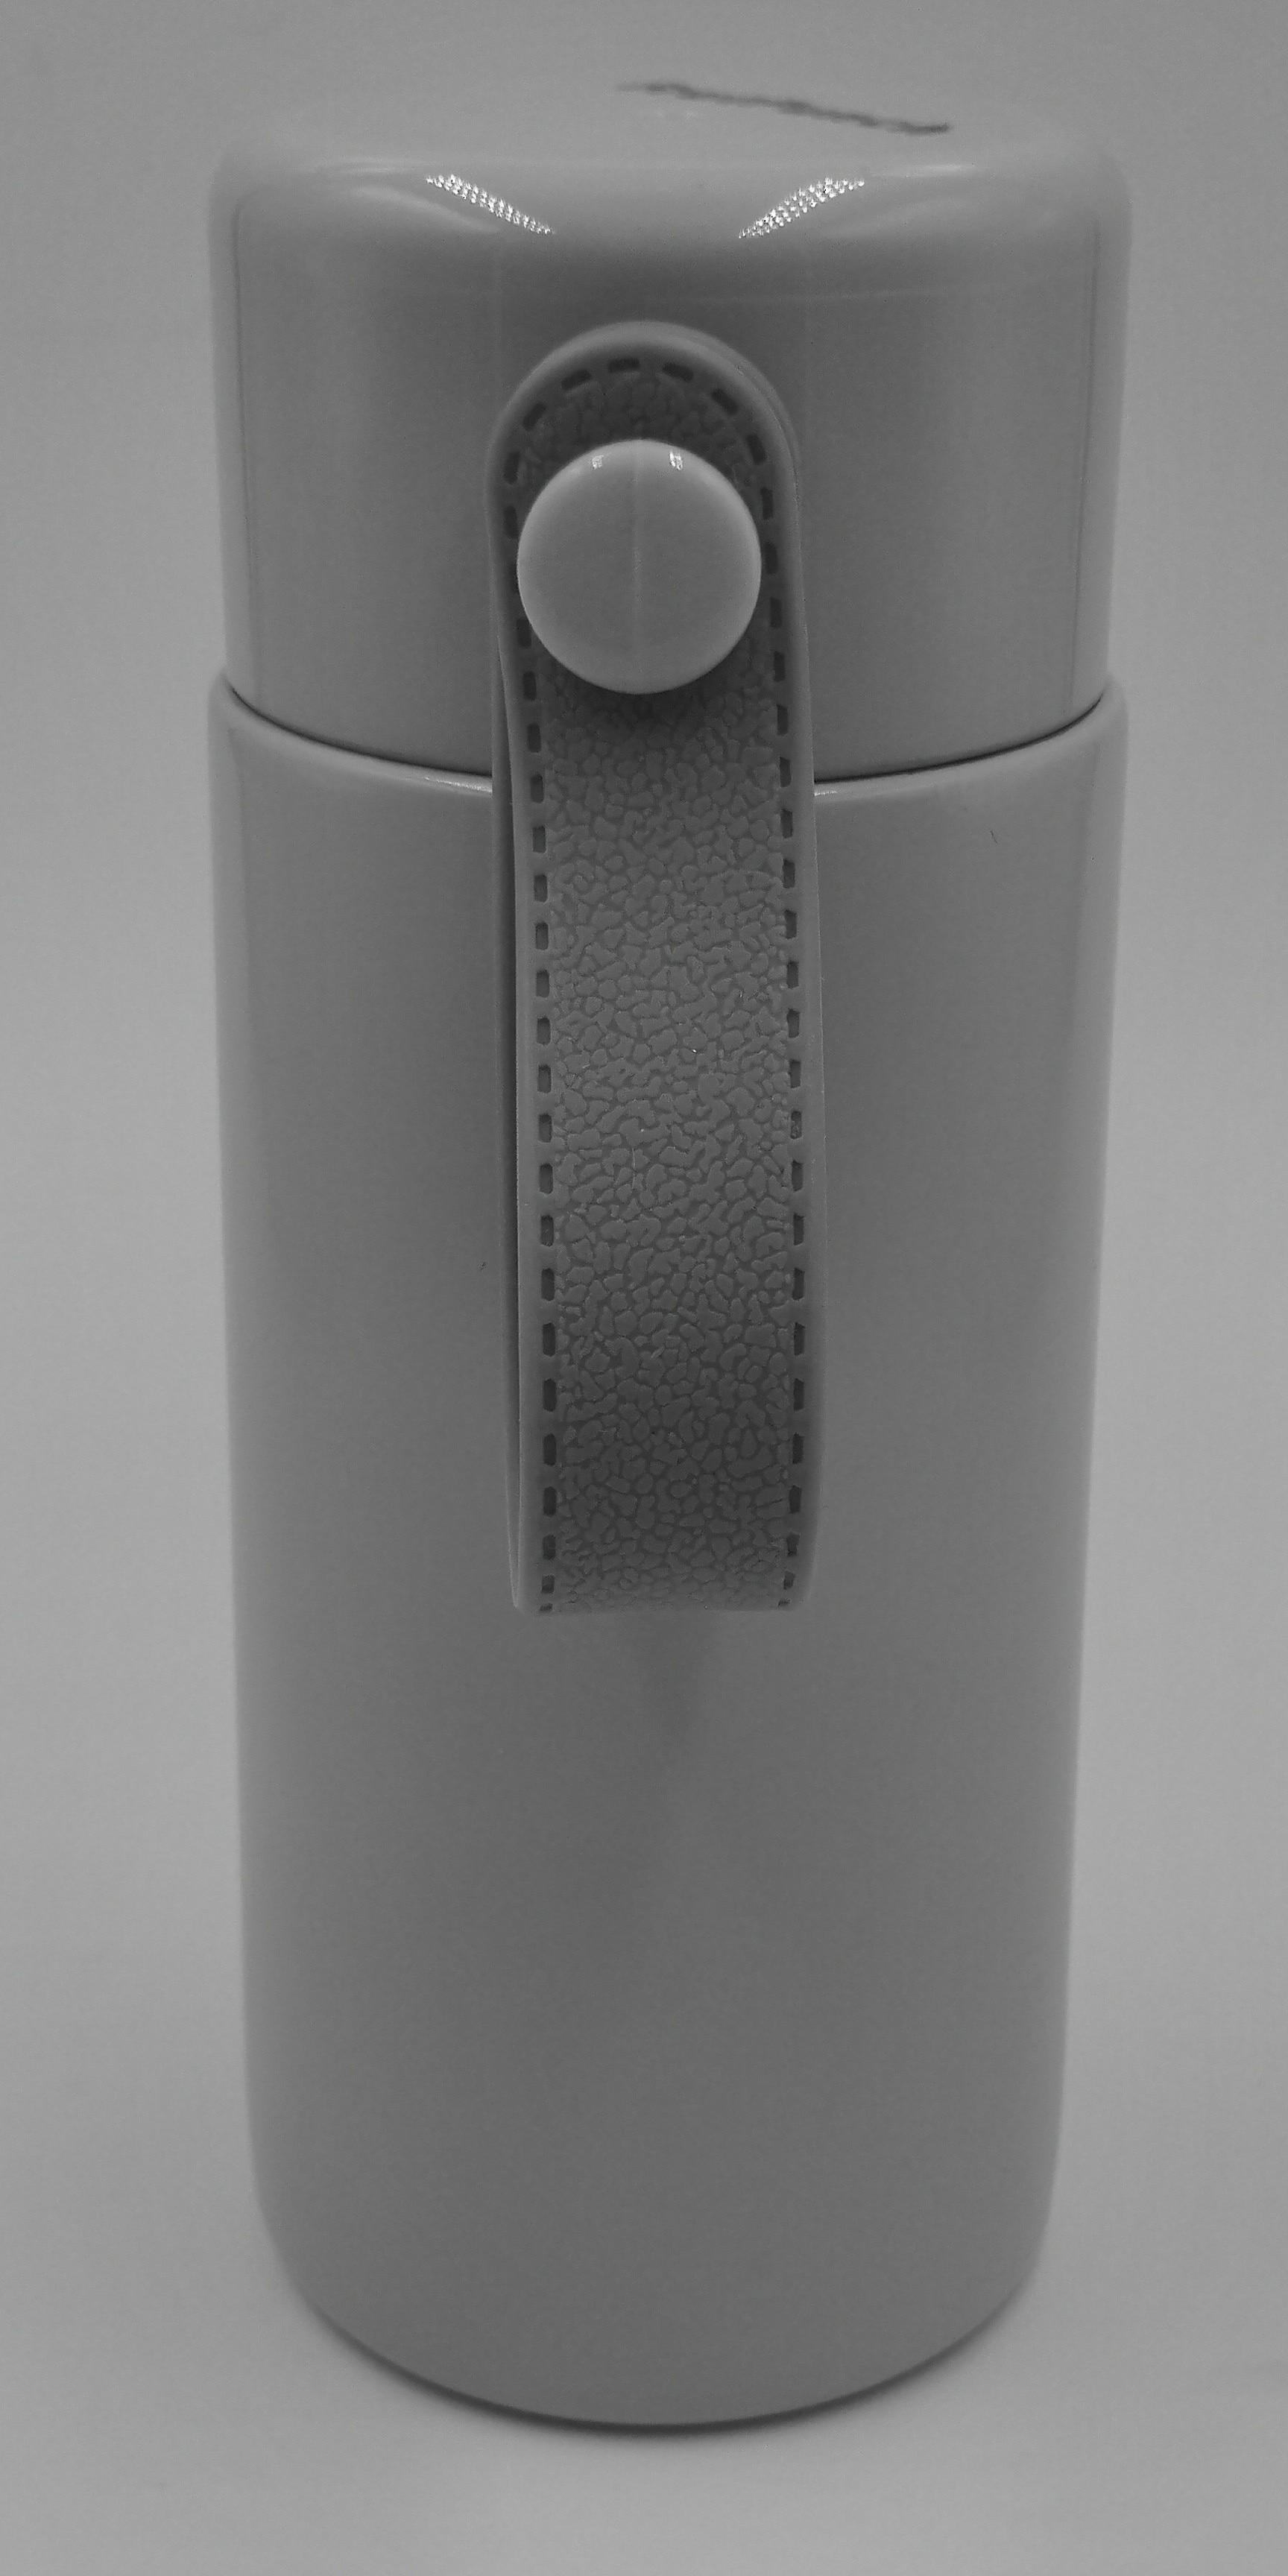 Botella de agua FrutPunch, botella de plástico de 200 ml para uso en exteriores, deporte, escuela, sello con cierre hermético, Gourde, escalada, Tour, botellas de agua